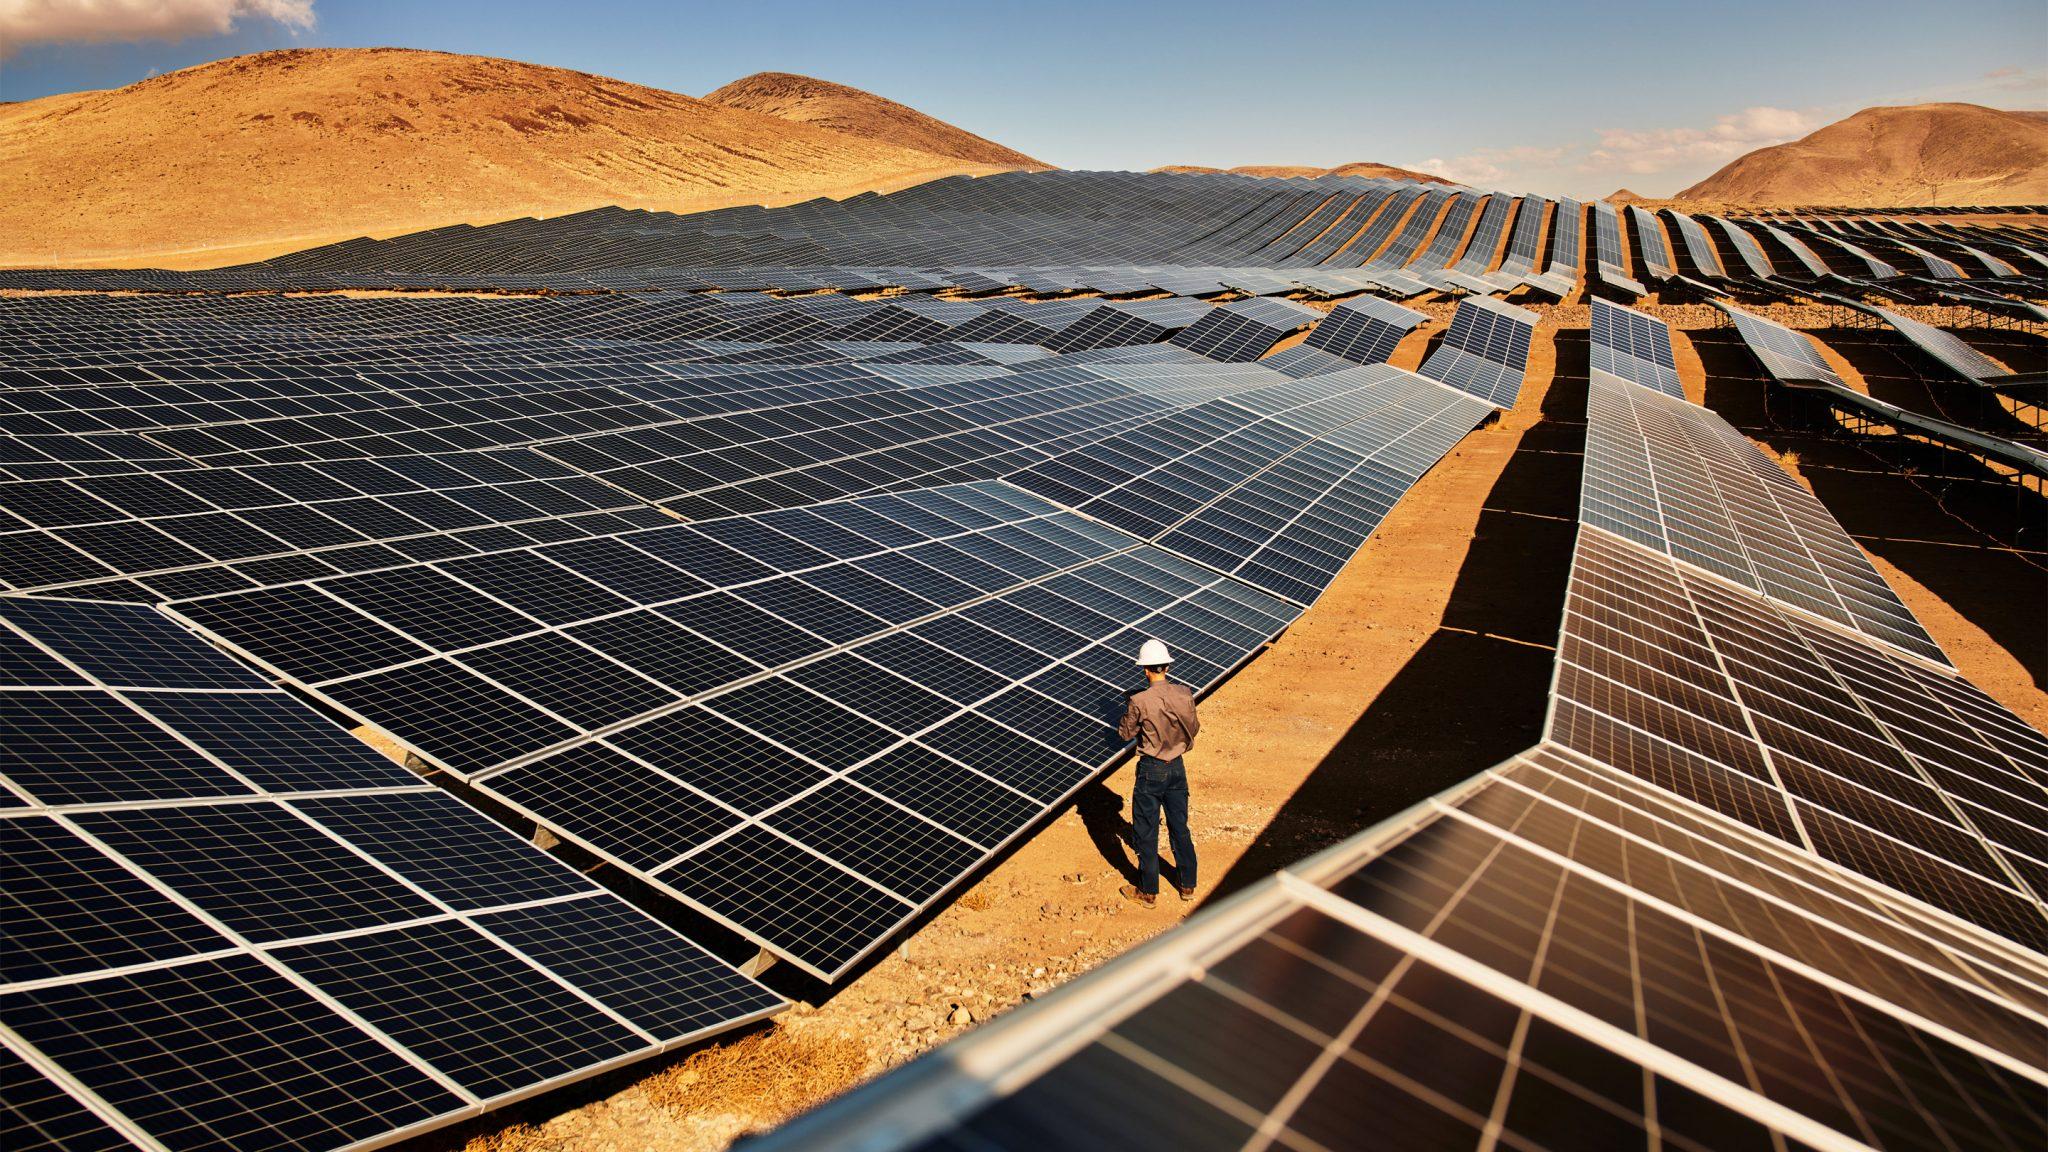 Apple details renewable energy projects